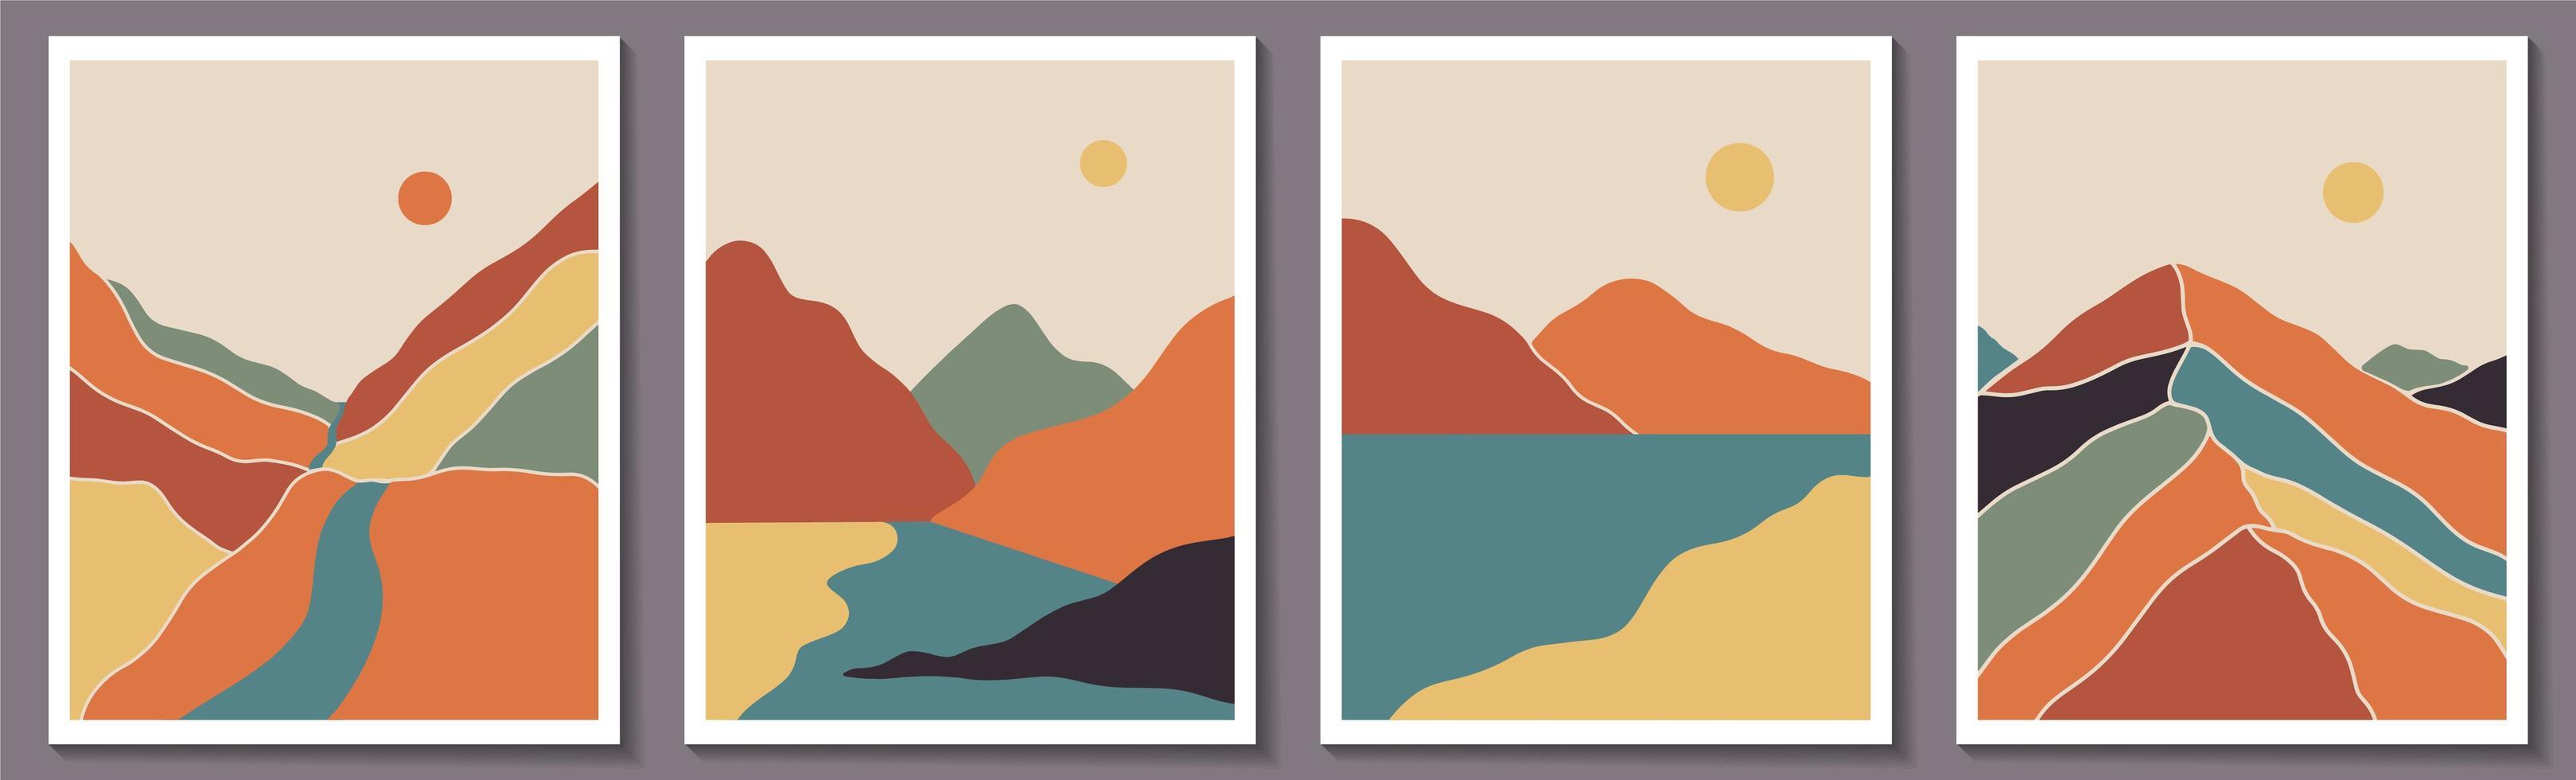 Boho contemporary landscape posters vector